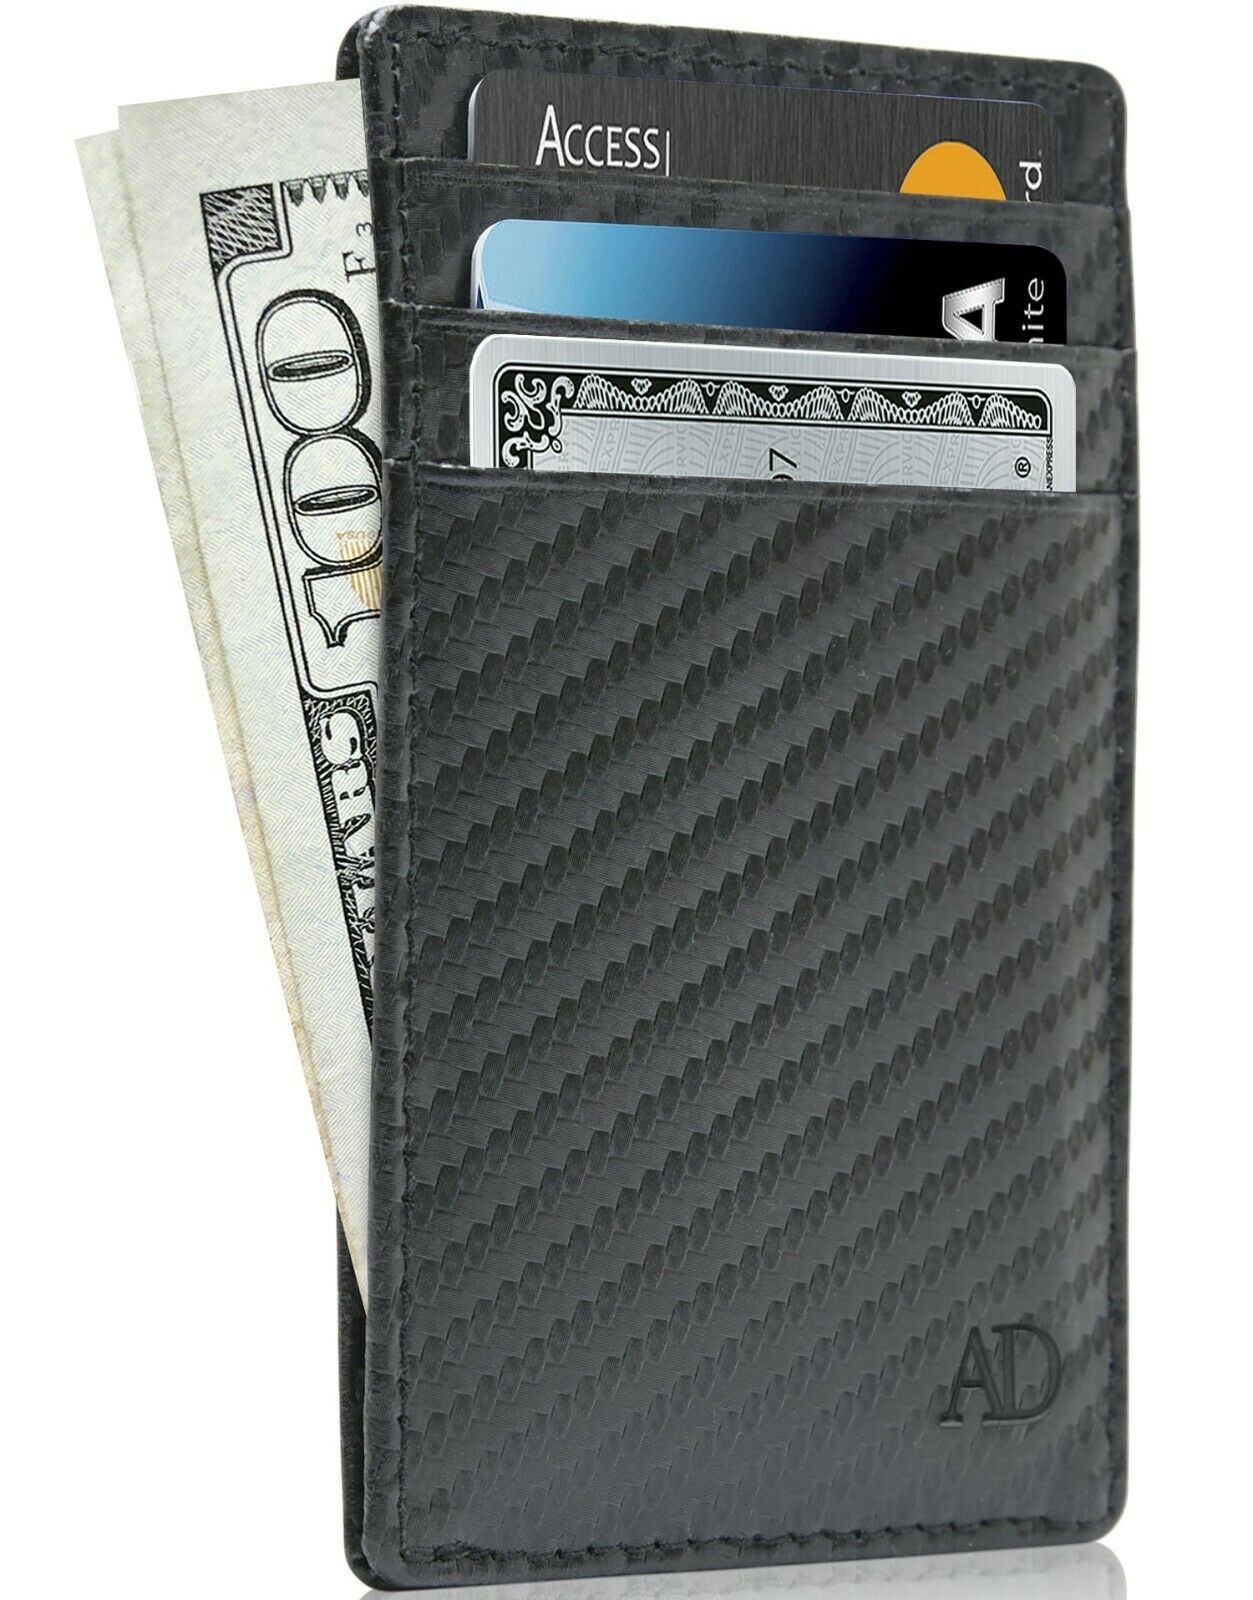 New Real Leather Slim Card Holder Wallets For Men & Women RFID Blocking